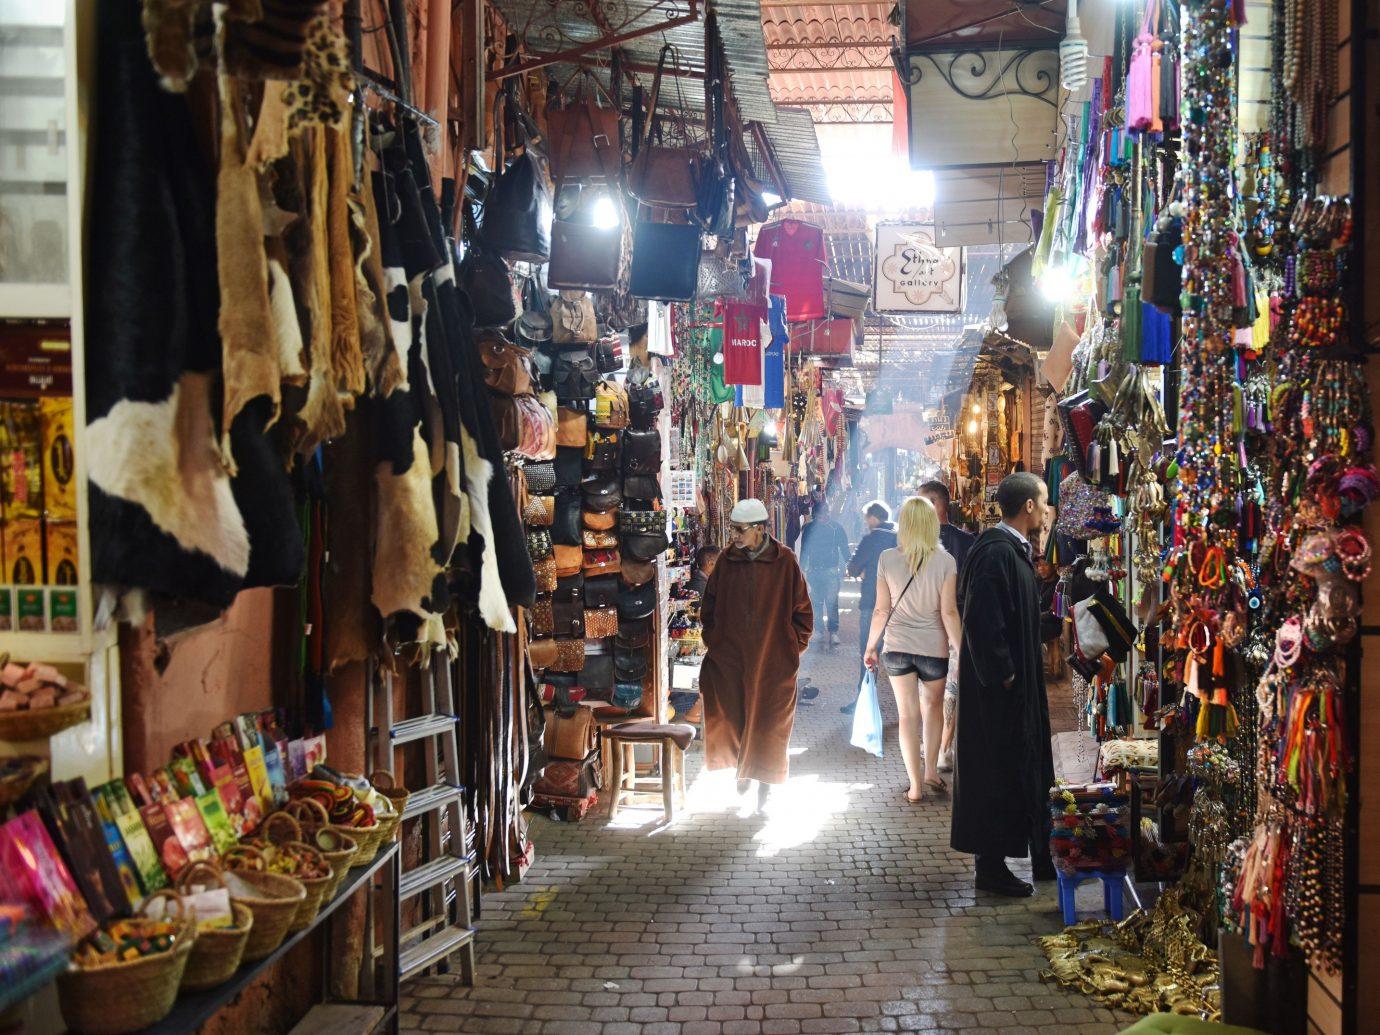 Jetsetter Guides market bazaar marketplace indoor City public space retail scene human settlement Boutique store vendor shopping floristry stall Shop cluttered